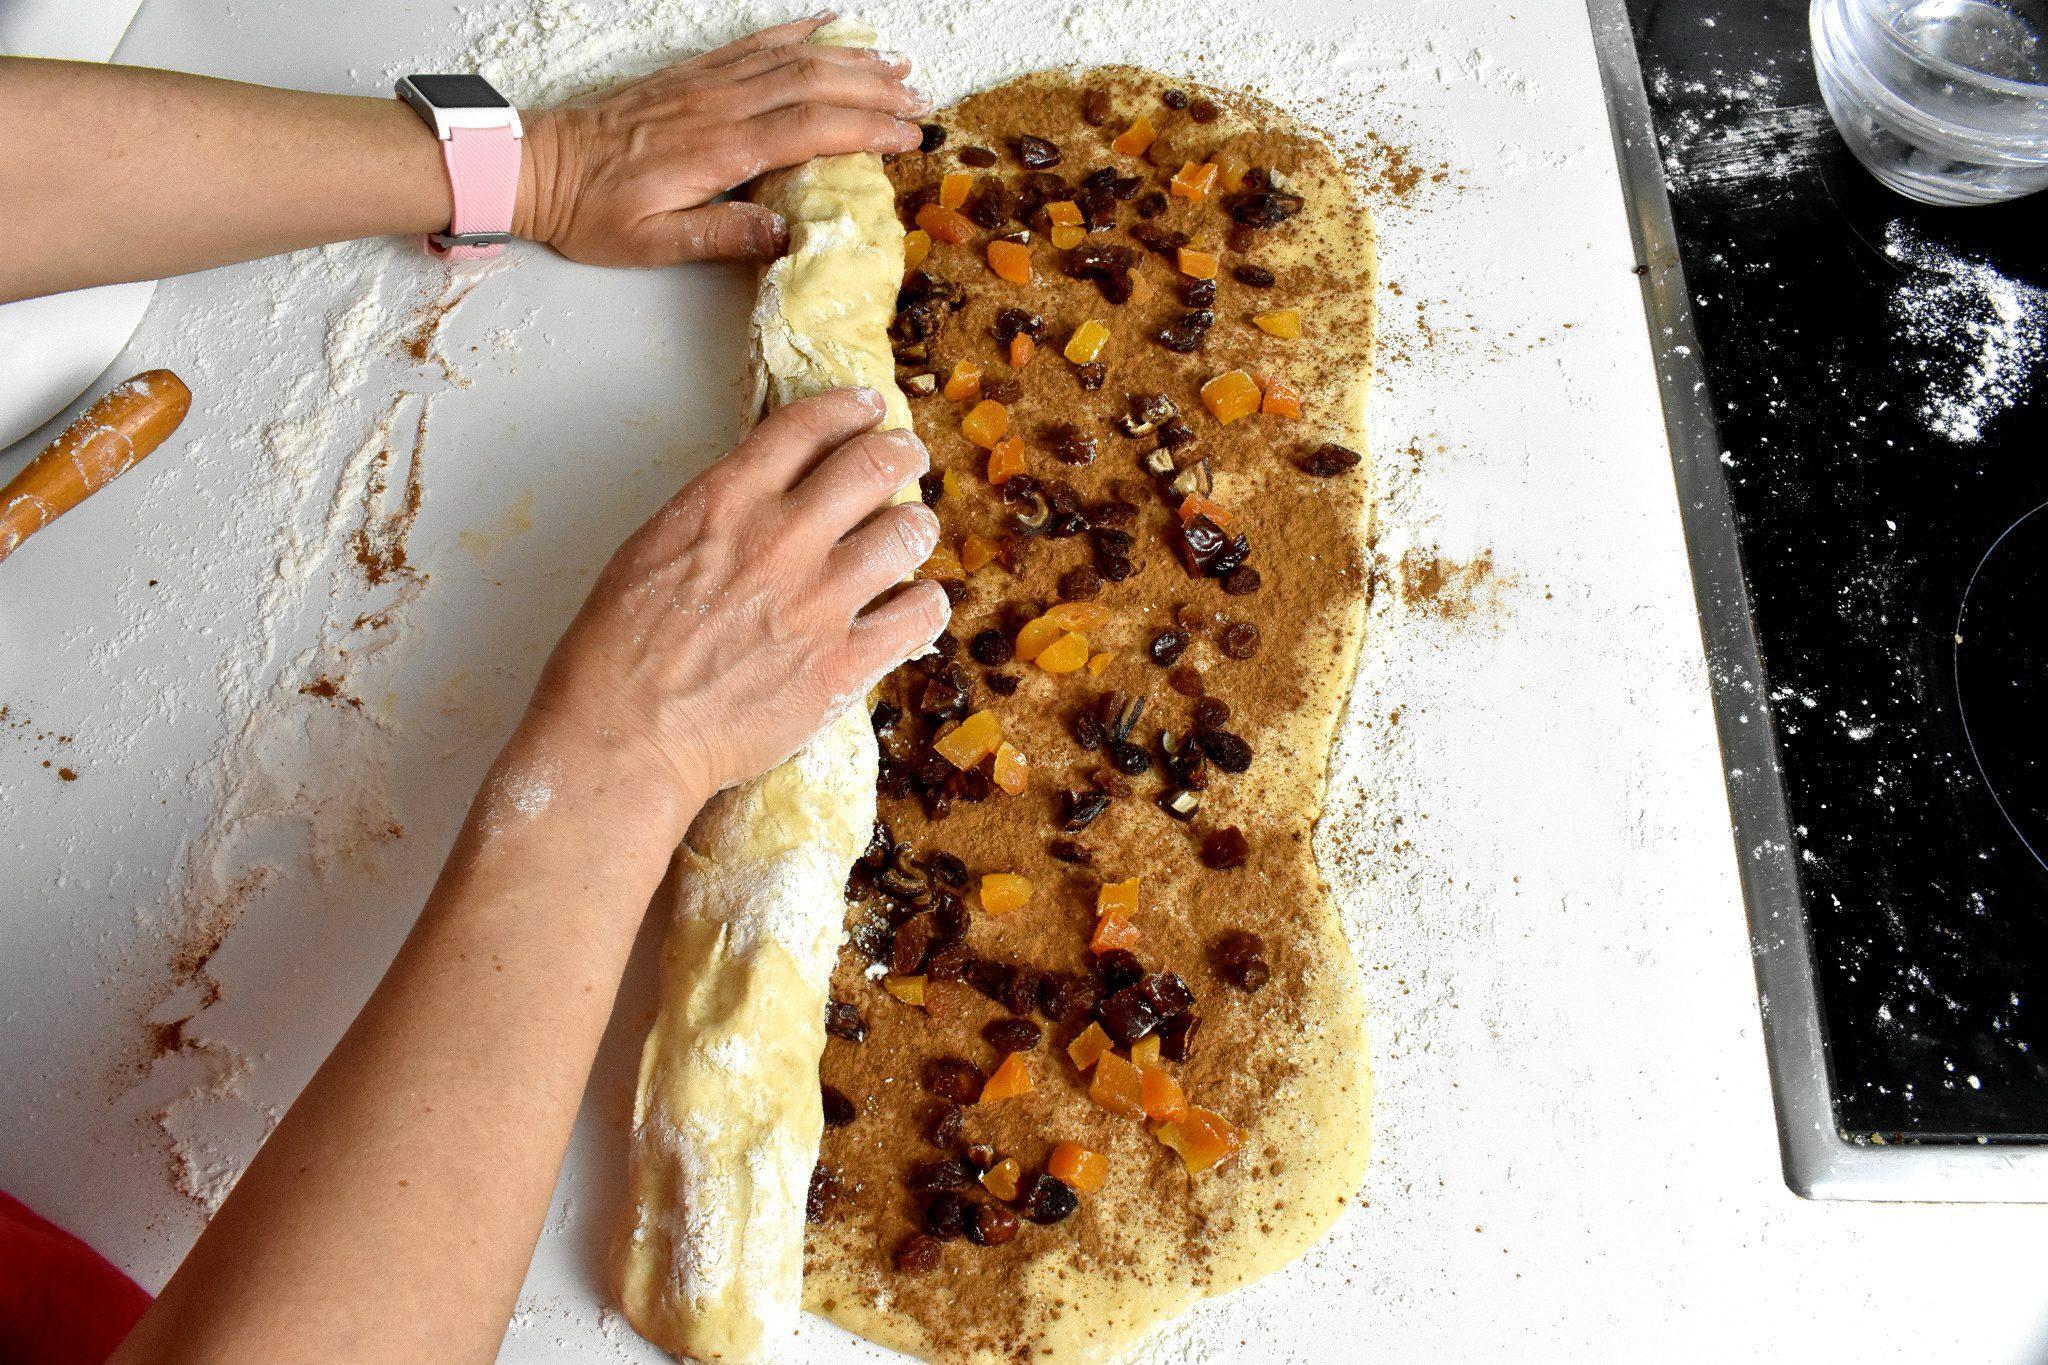 Roscon-de-reyes-King-cake-process-6-SunCakeMom